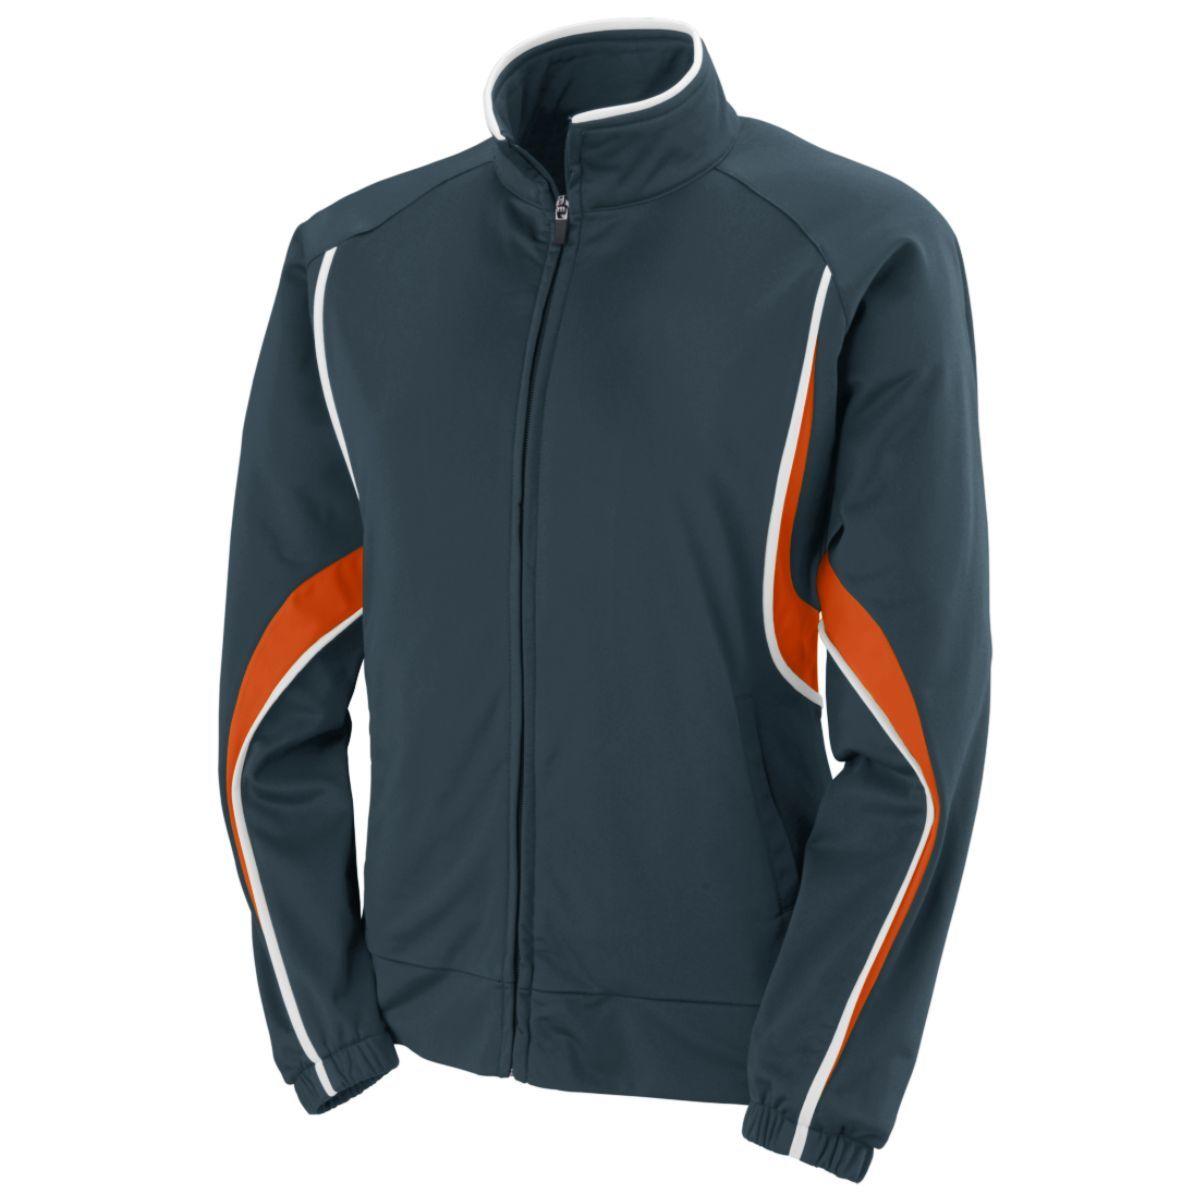 Ladies Rival Jacket - SLATE/ORANGE/WHITE